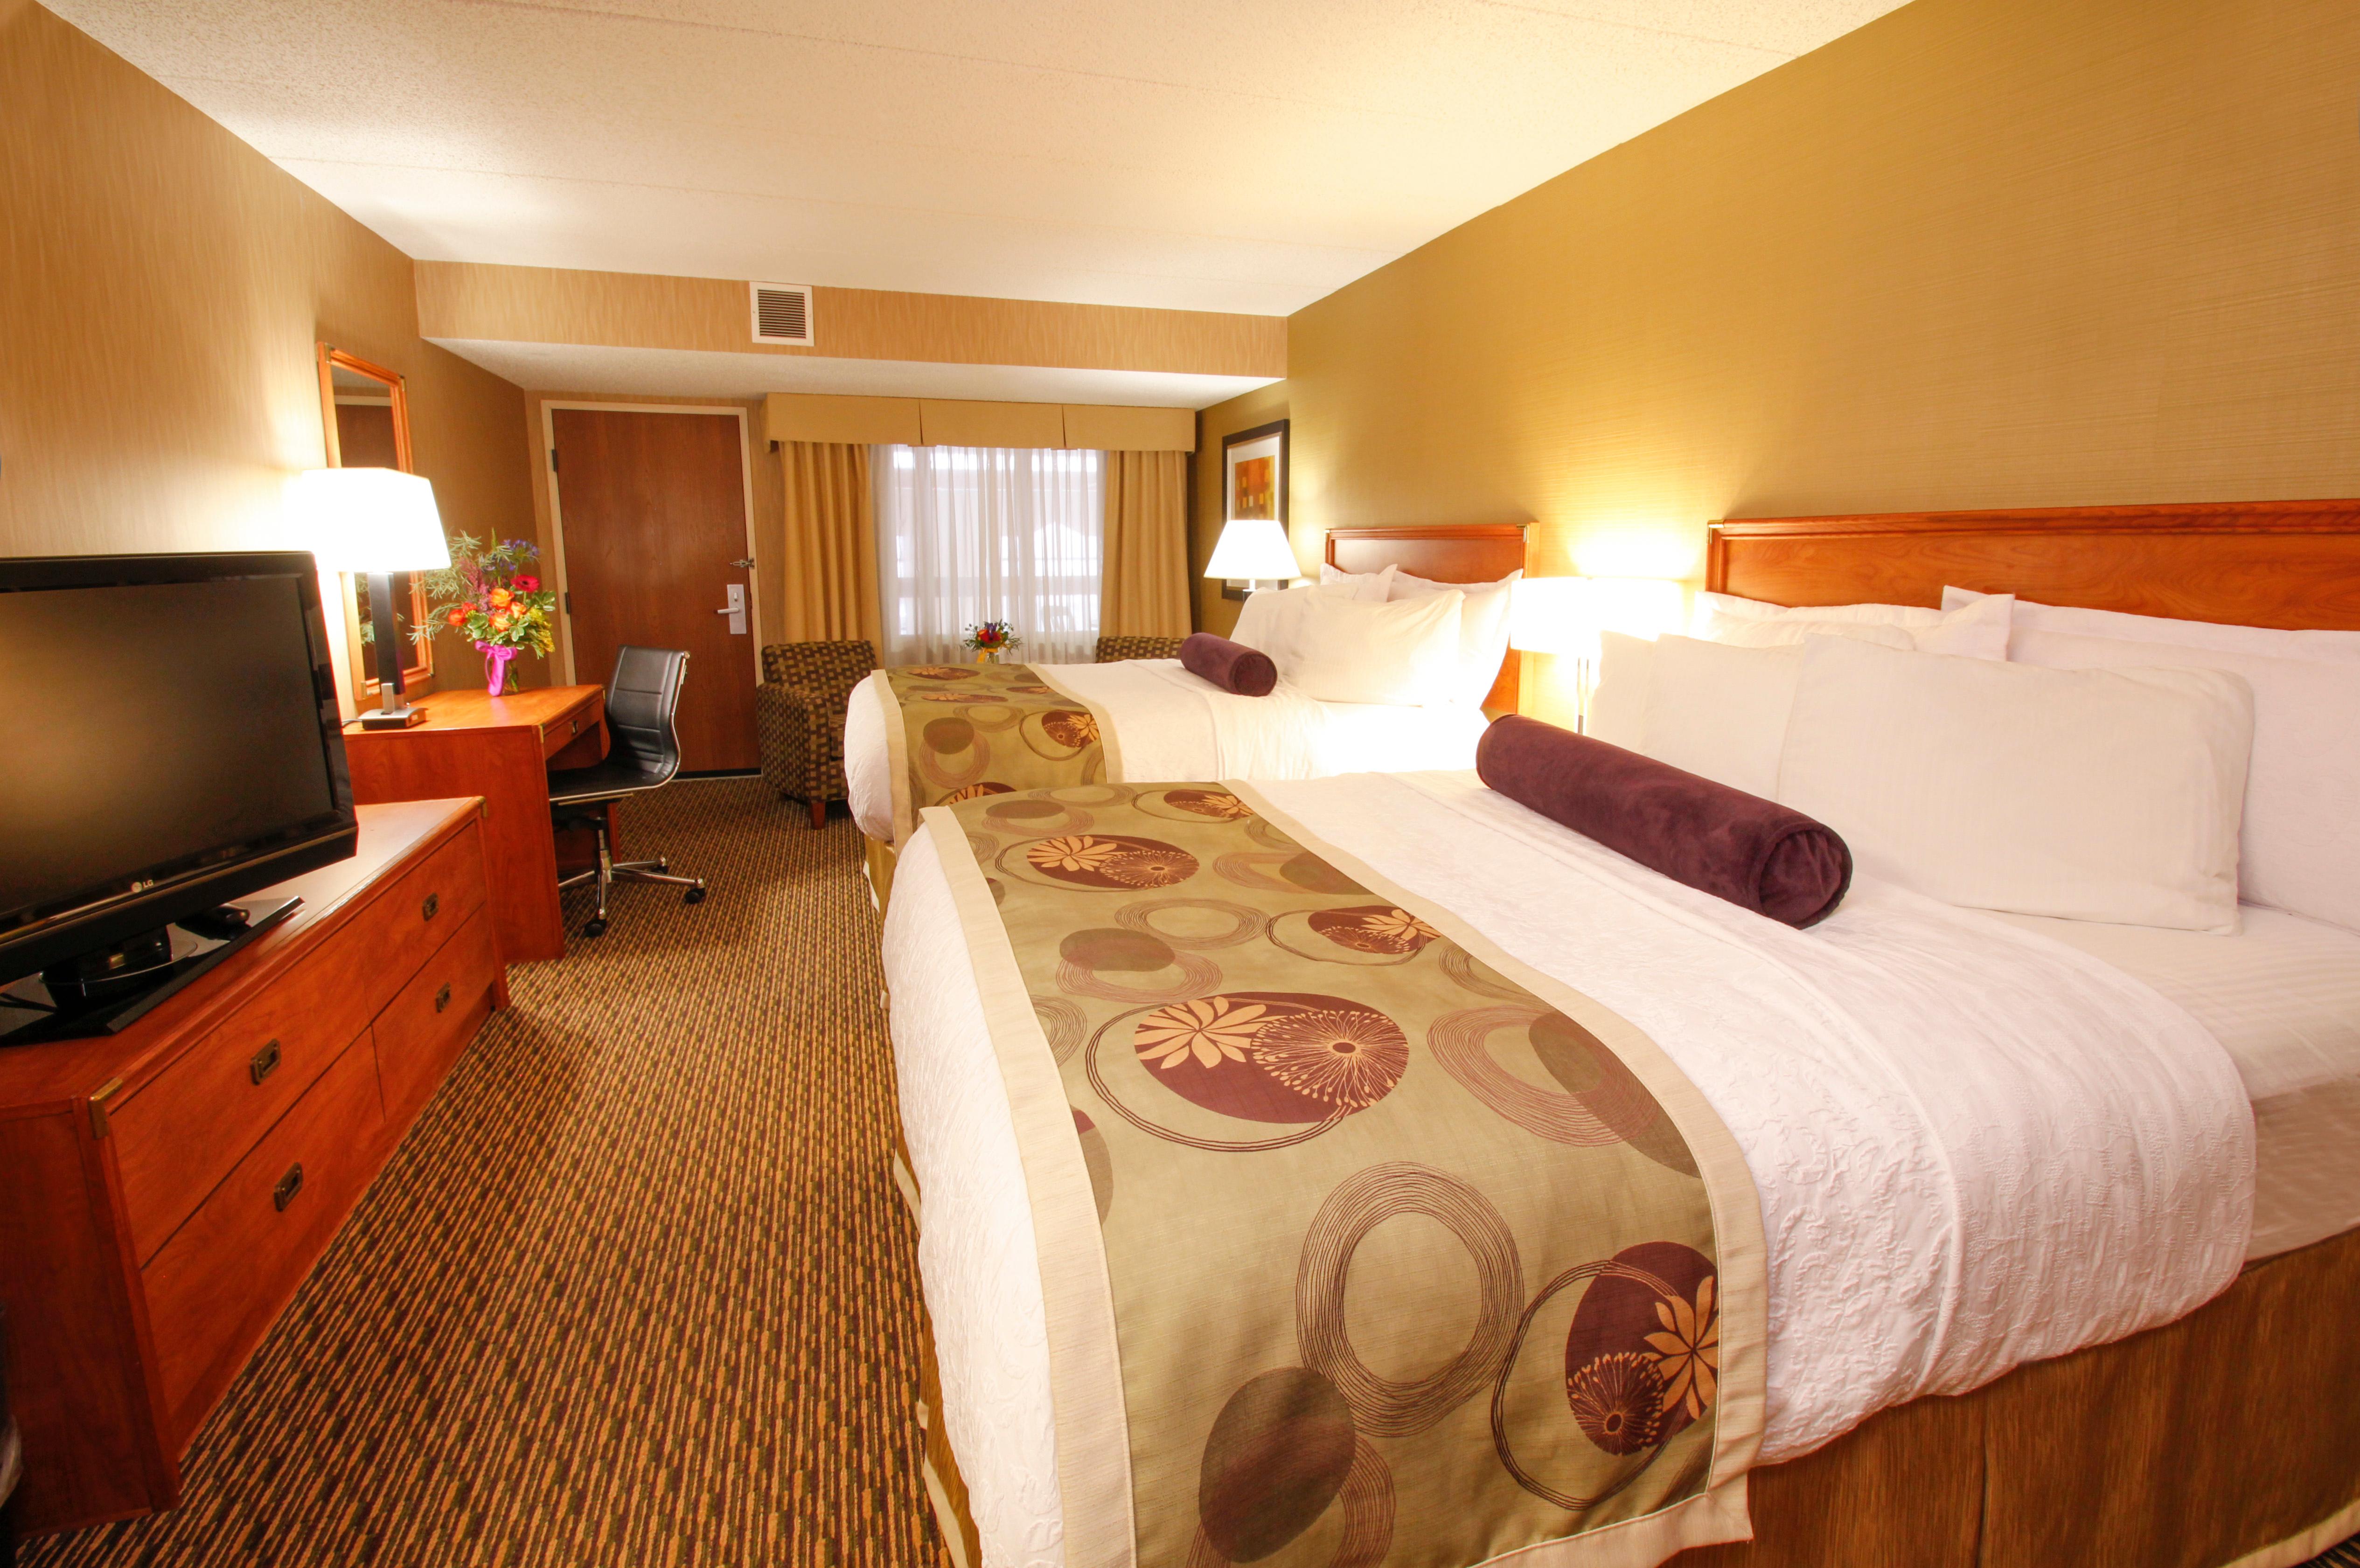 The Inn on Lake Superior image 5